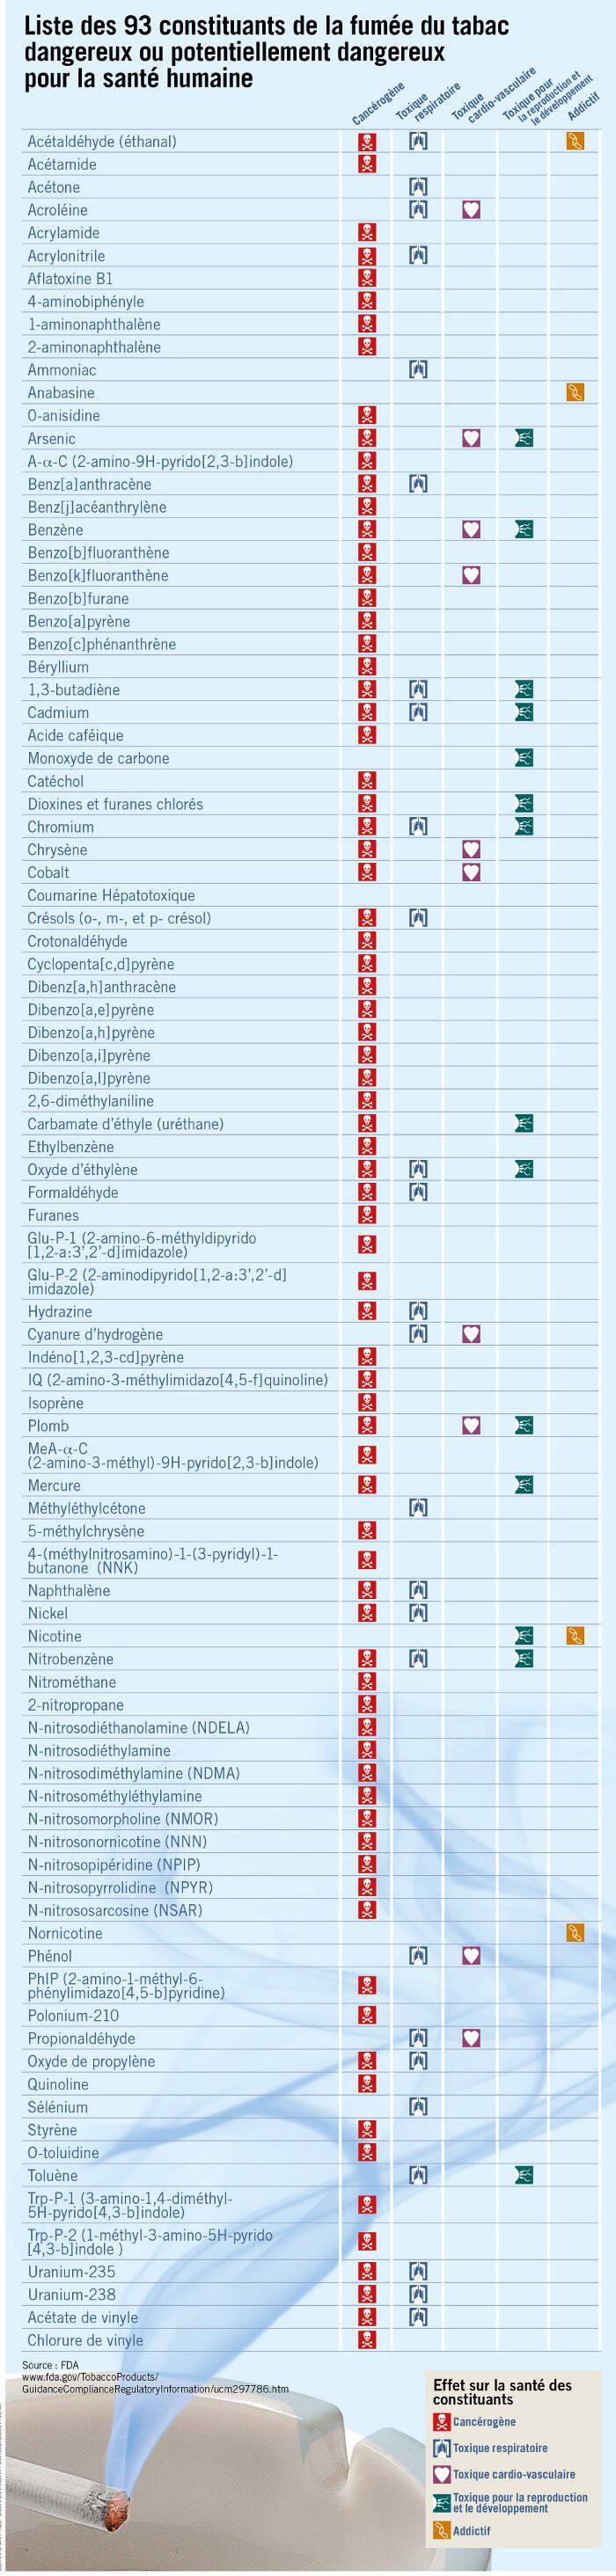 elements-toxiques-du-tabac